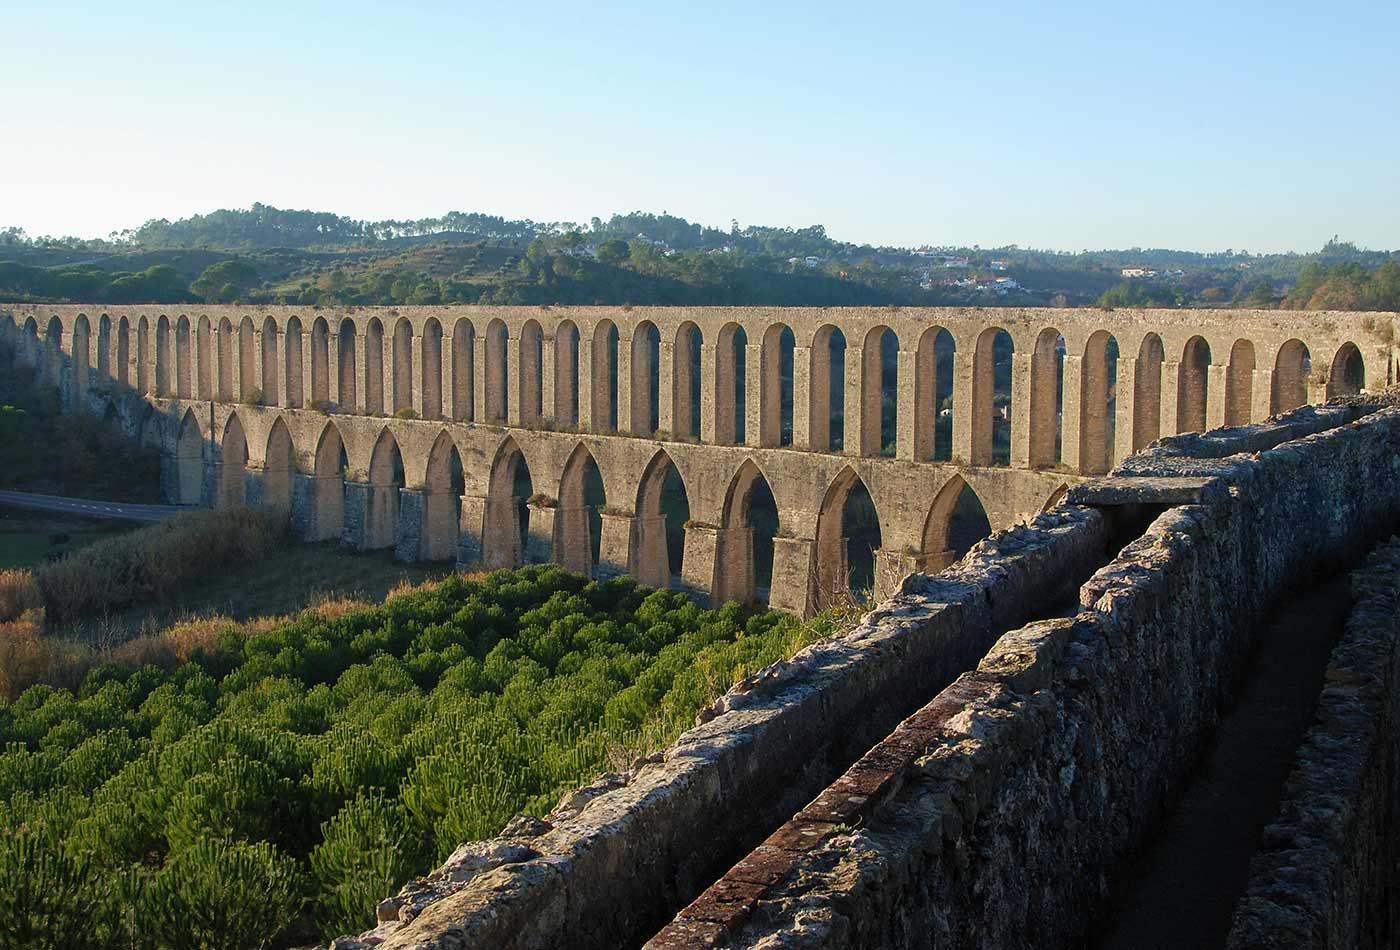 Aqueduct of Pegões, Tomar, Portugal.